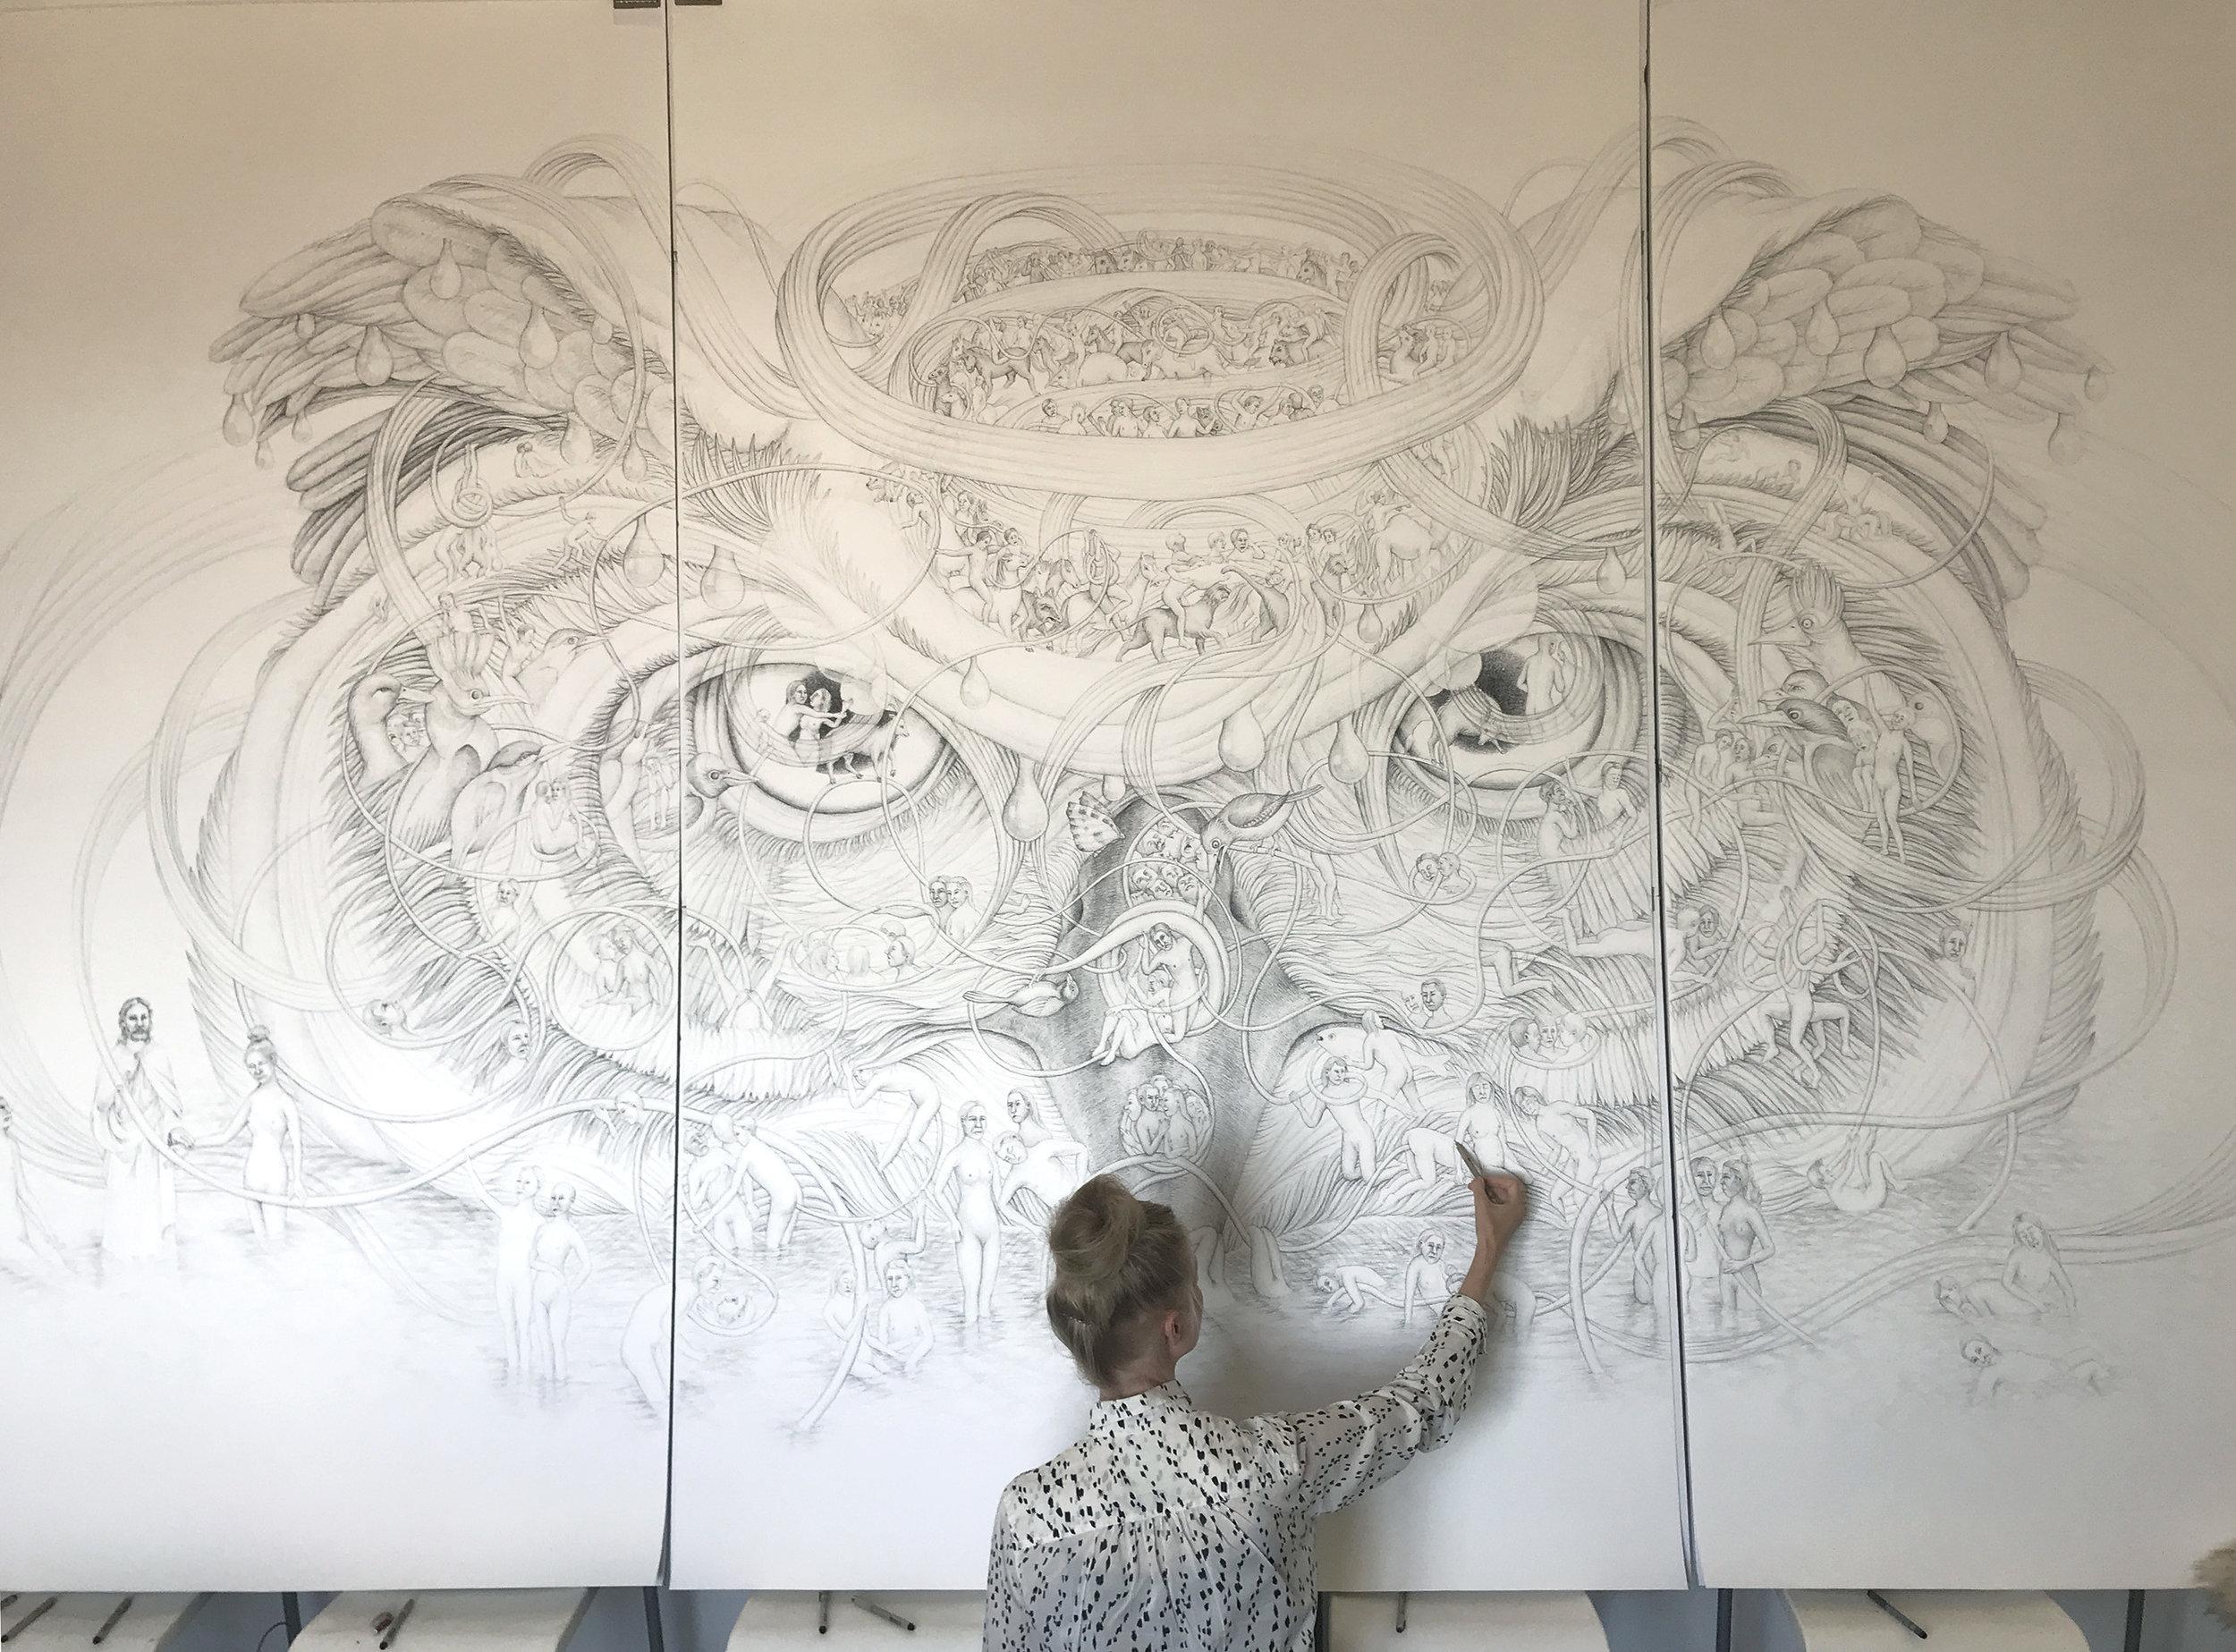 Eeva Honkanen with  The Owl's Head  (2019), inkpen on paper. Picture by Vanessa Kowalski.